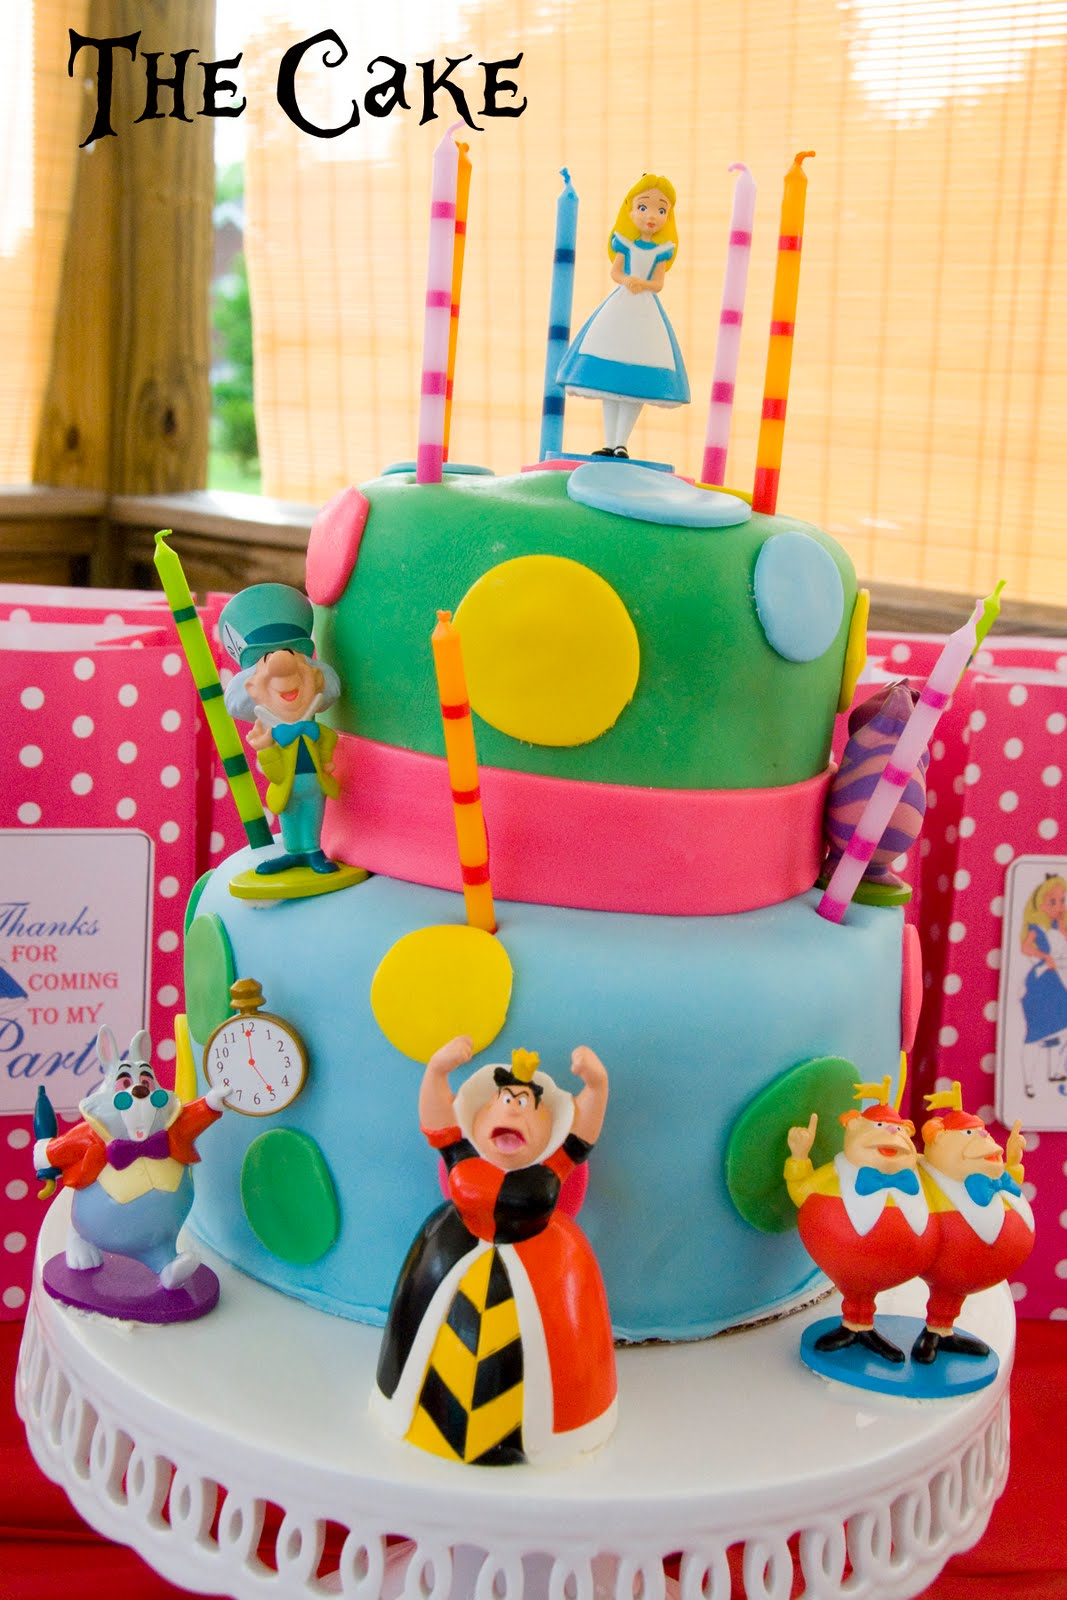 Alice in wonderland party ideas - Alice in wonderland party decorations ideas ...